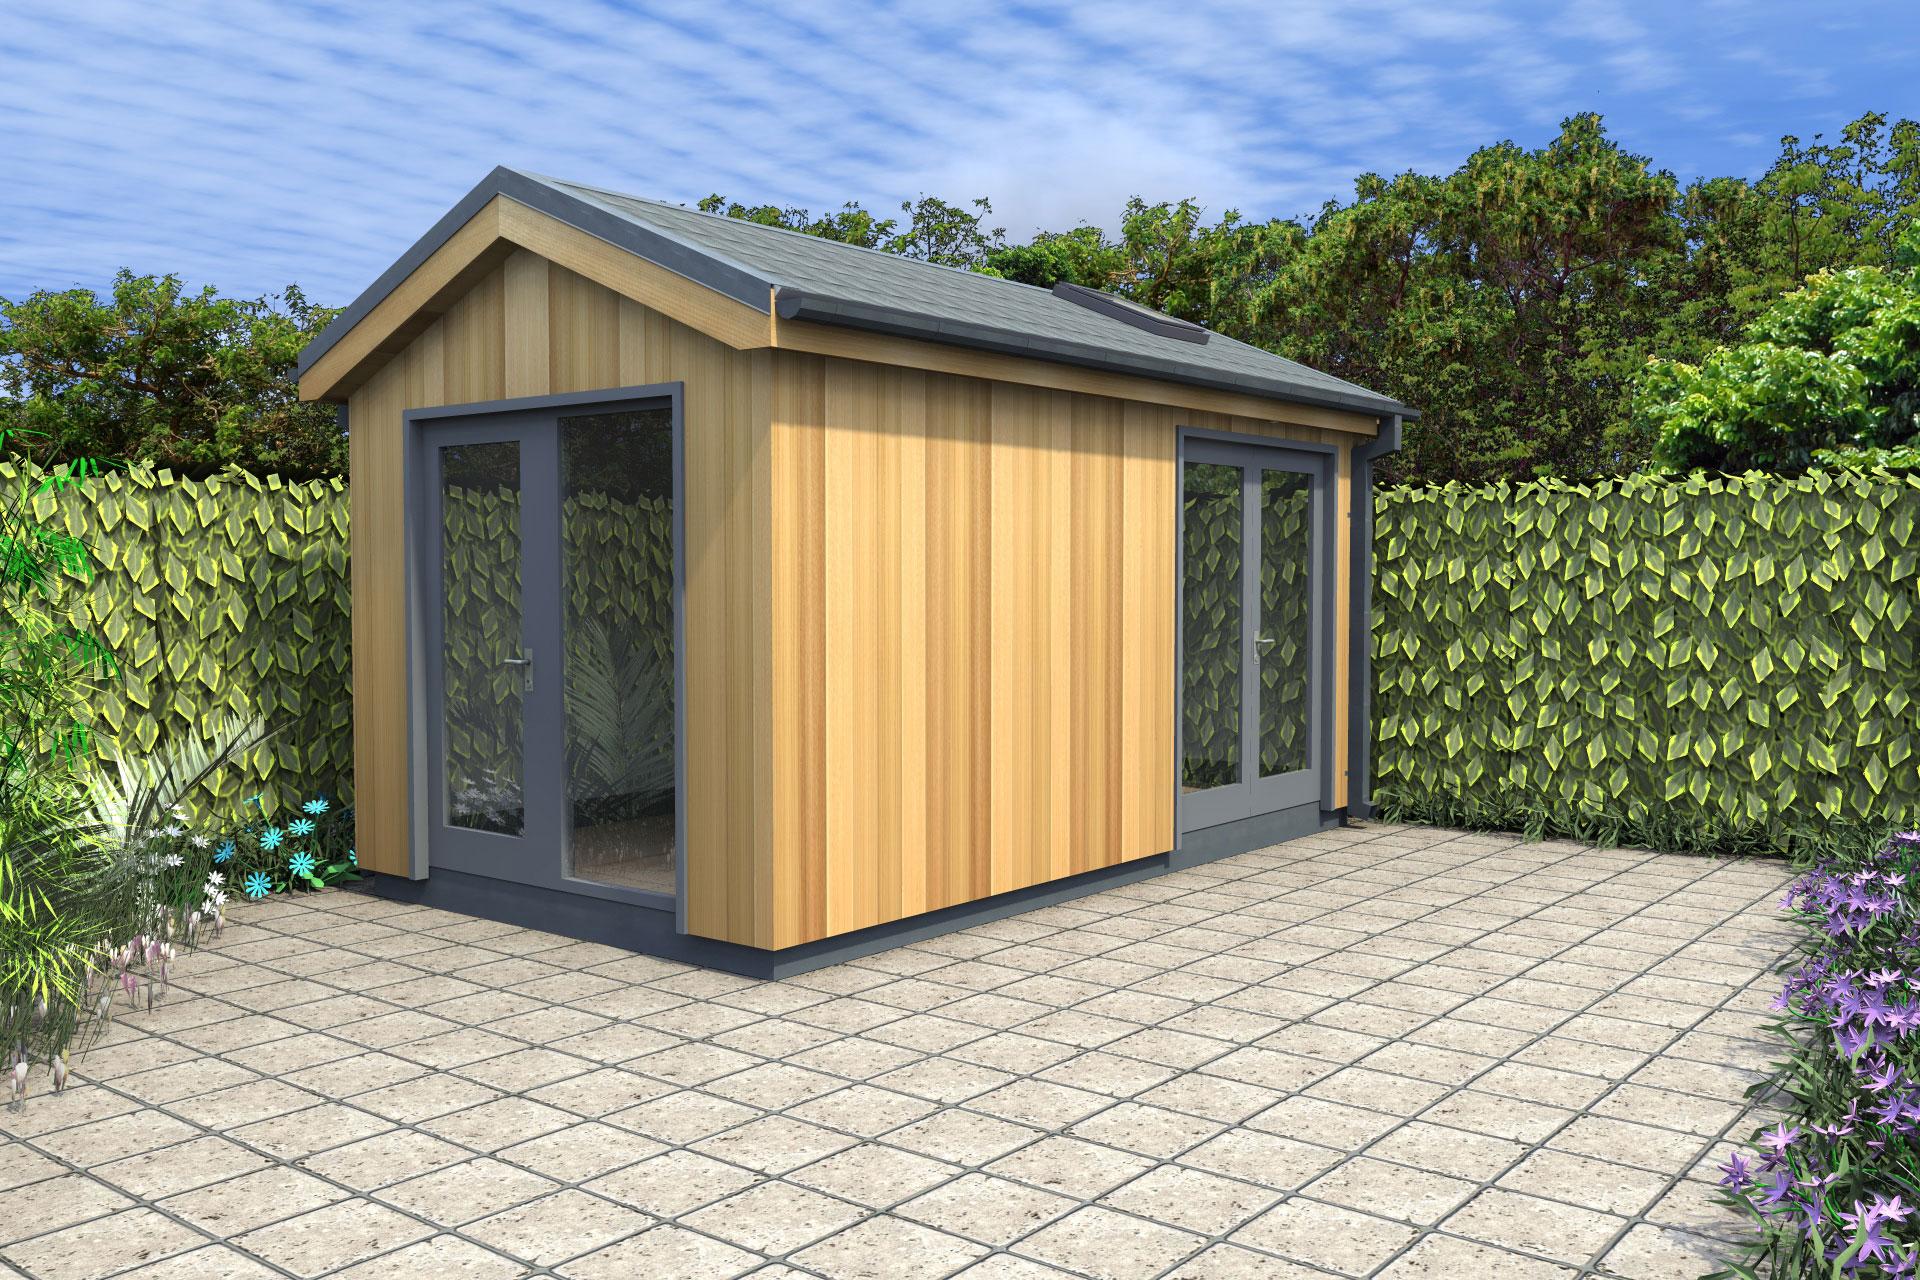 Office Pods Ideas Gallery, Garden Office Ideas Gallery | ECOS Ireland